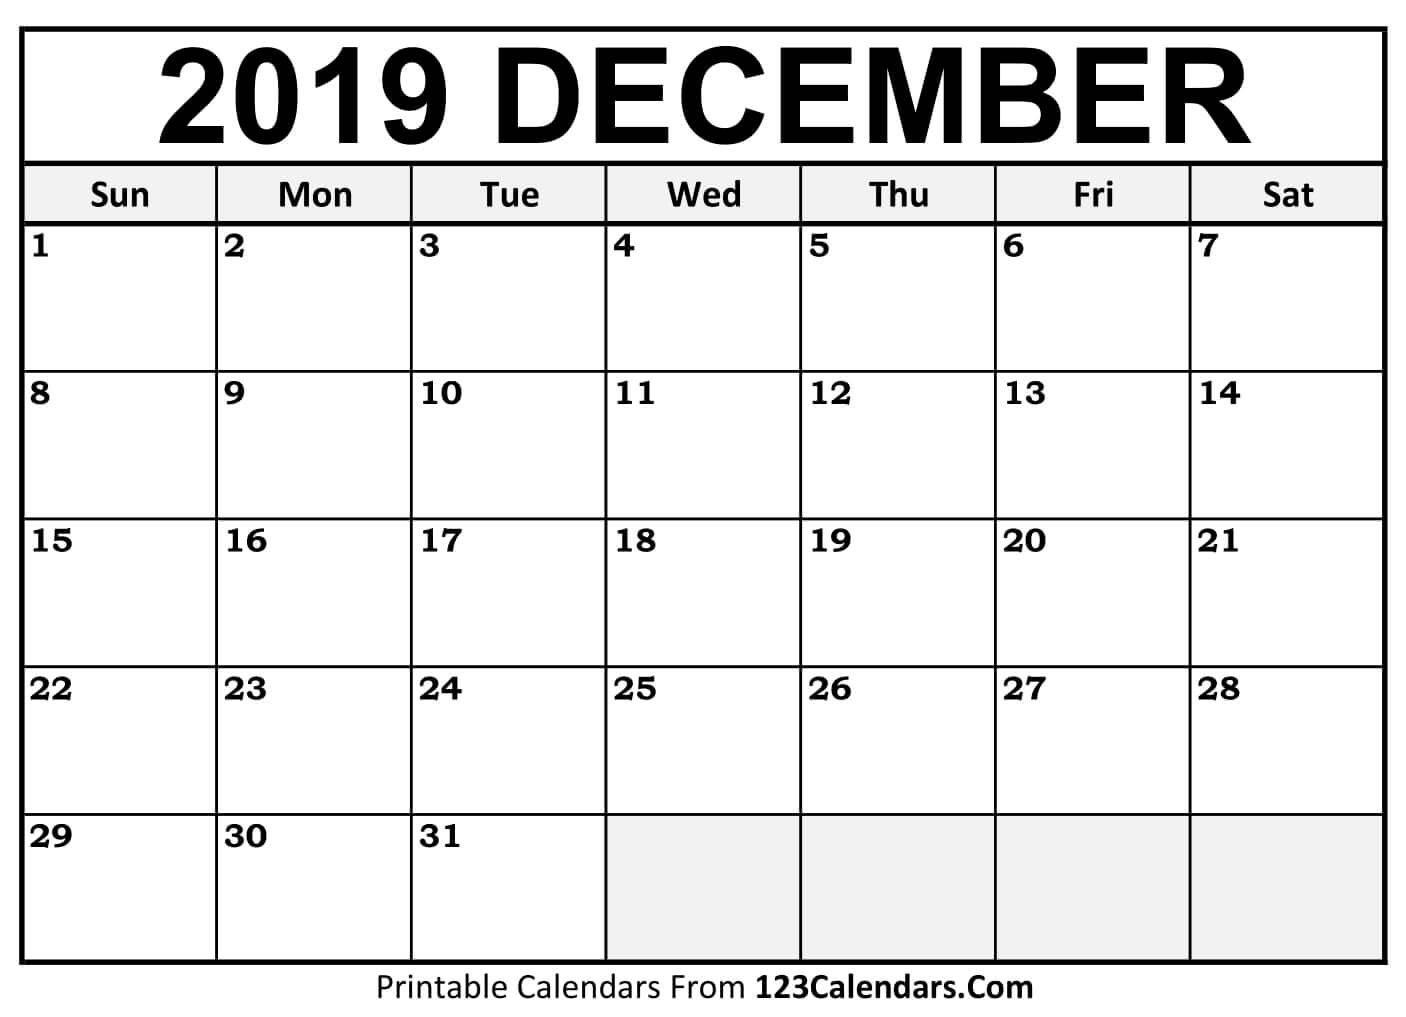 Printable December 2019 Calendar Templates - 123Calendars Calendar 2019 Dec